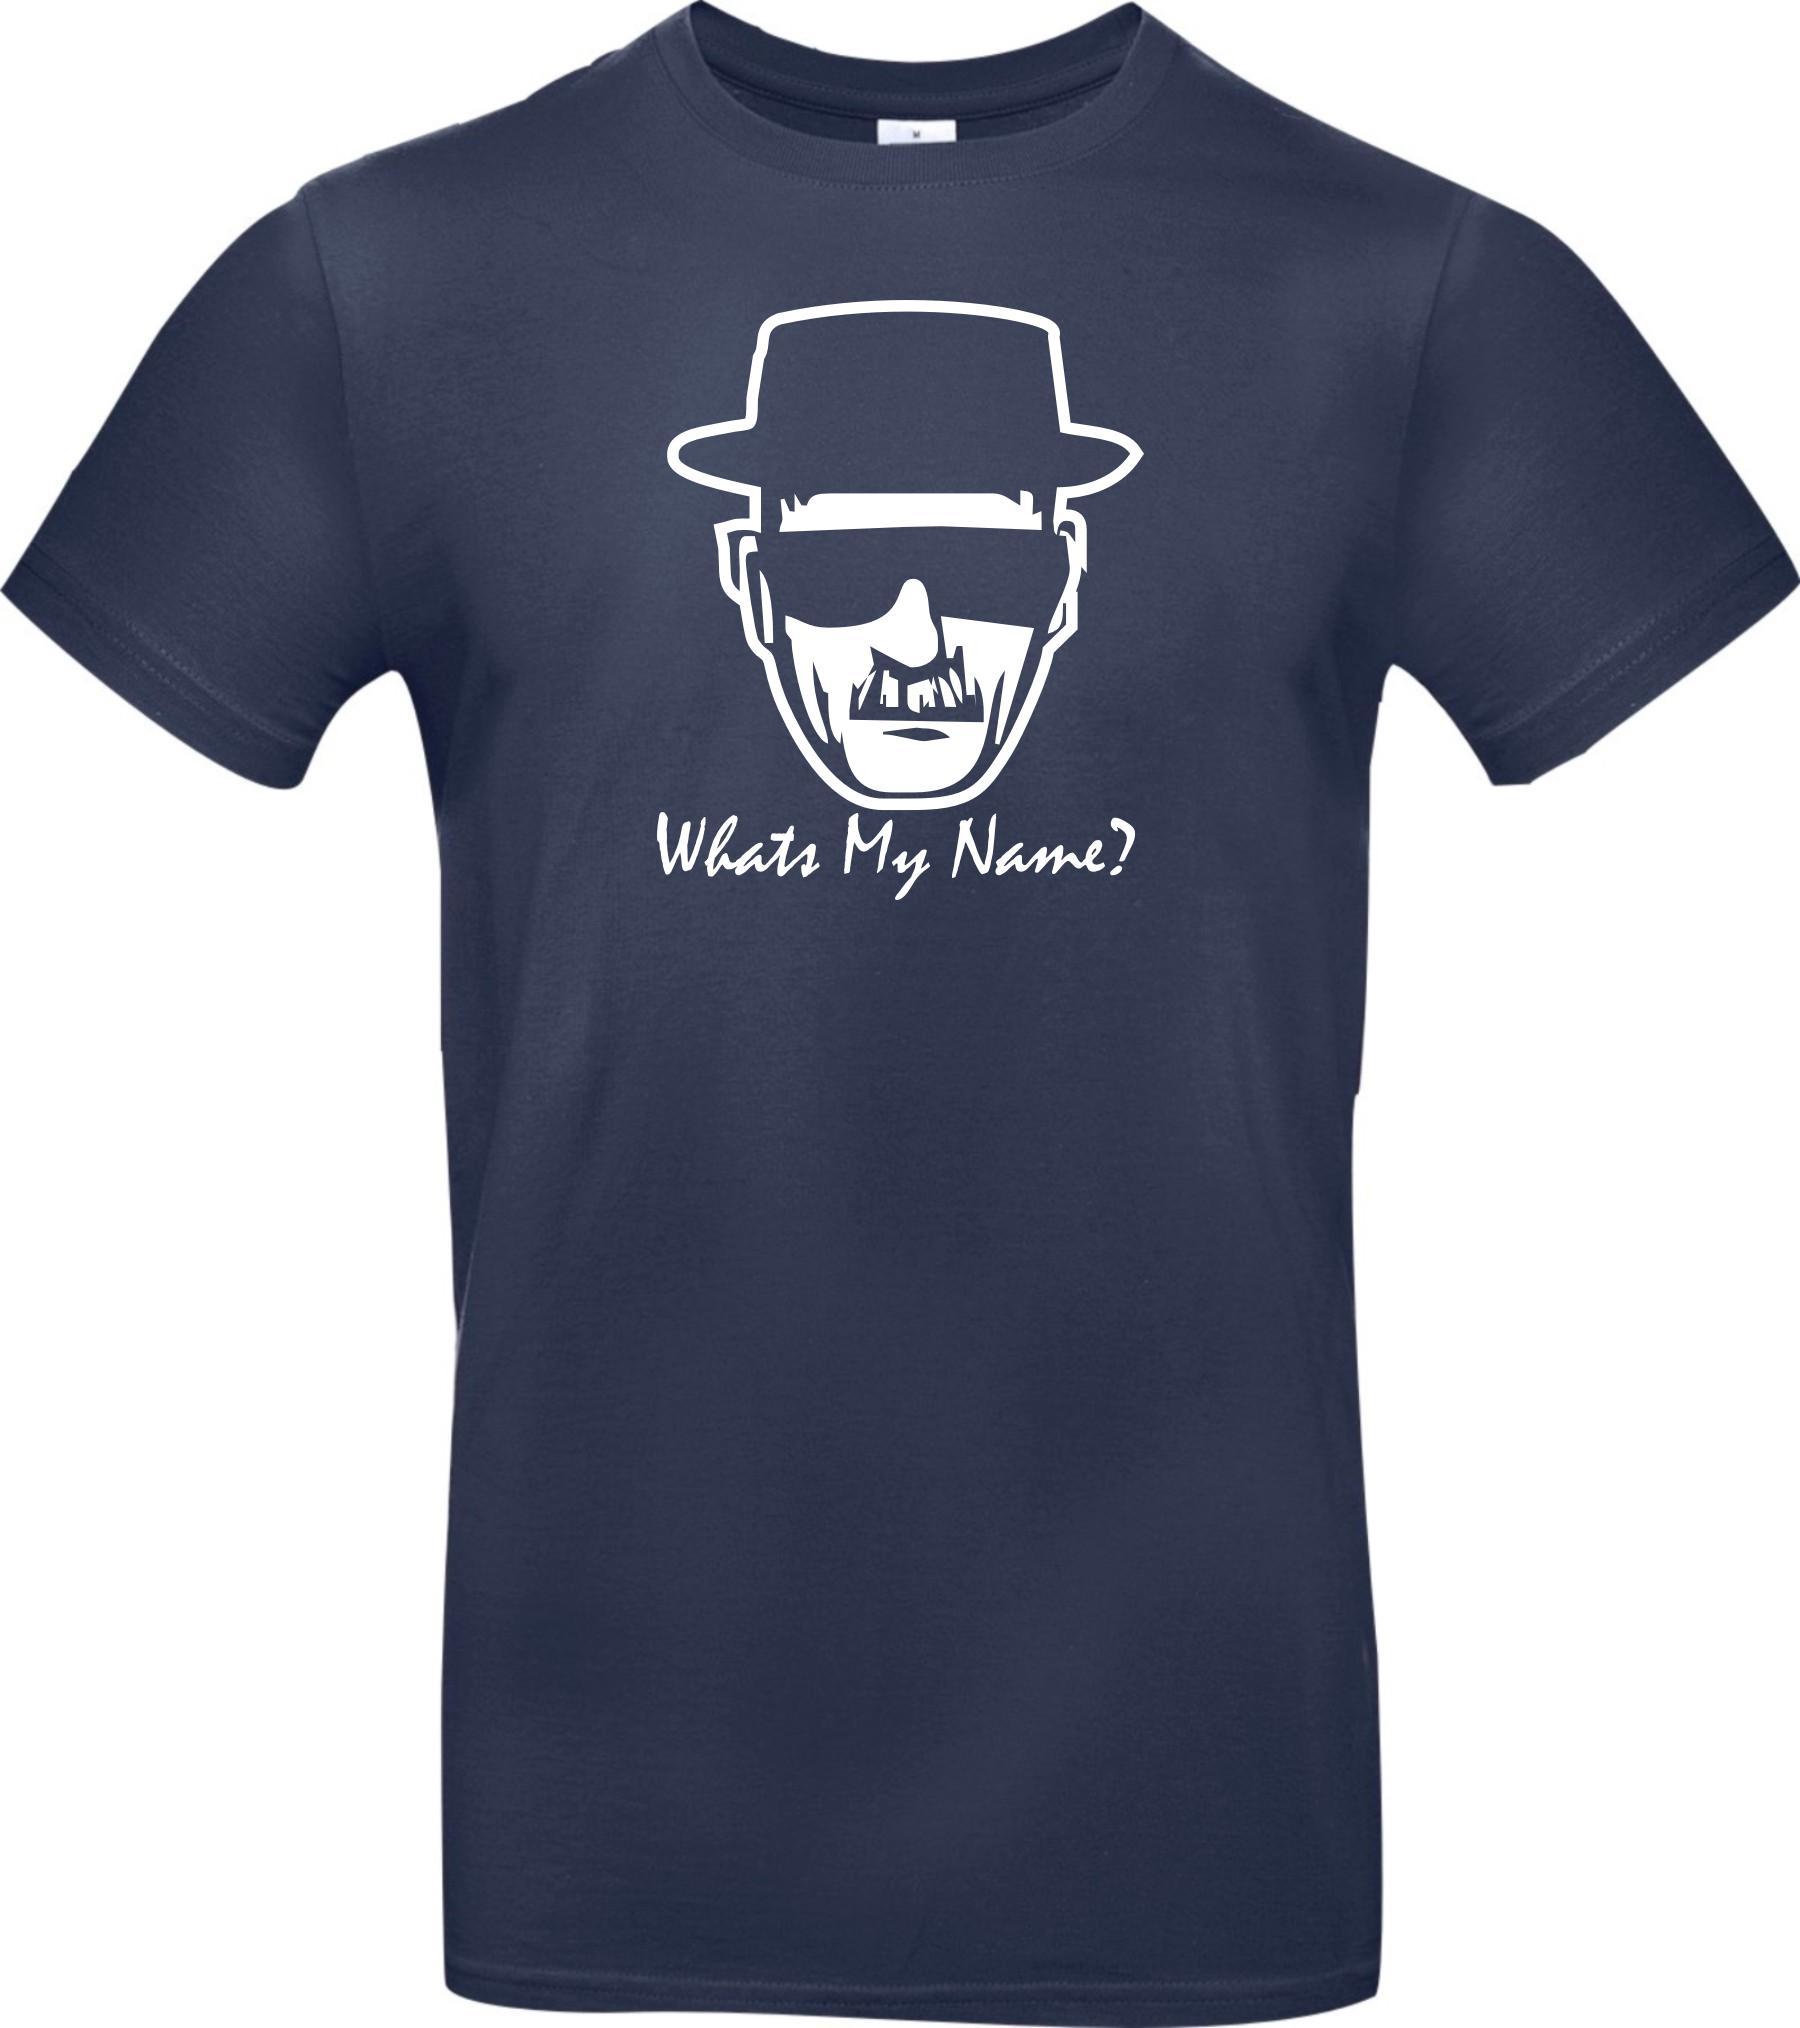 Unisex-T-Shirt-BREAKING-BAD-HEISENBERG-White-Whats-My-Name-Groesse-S-XXXL